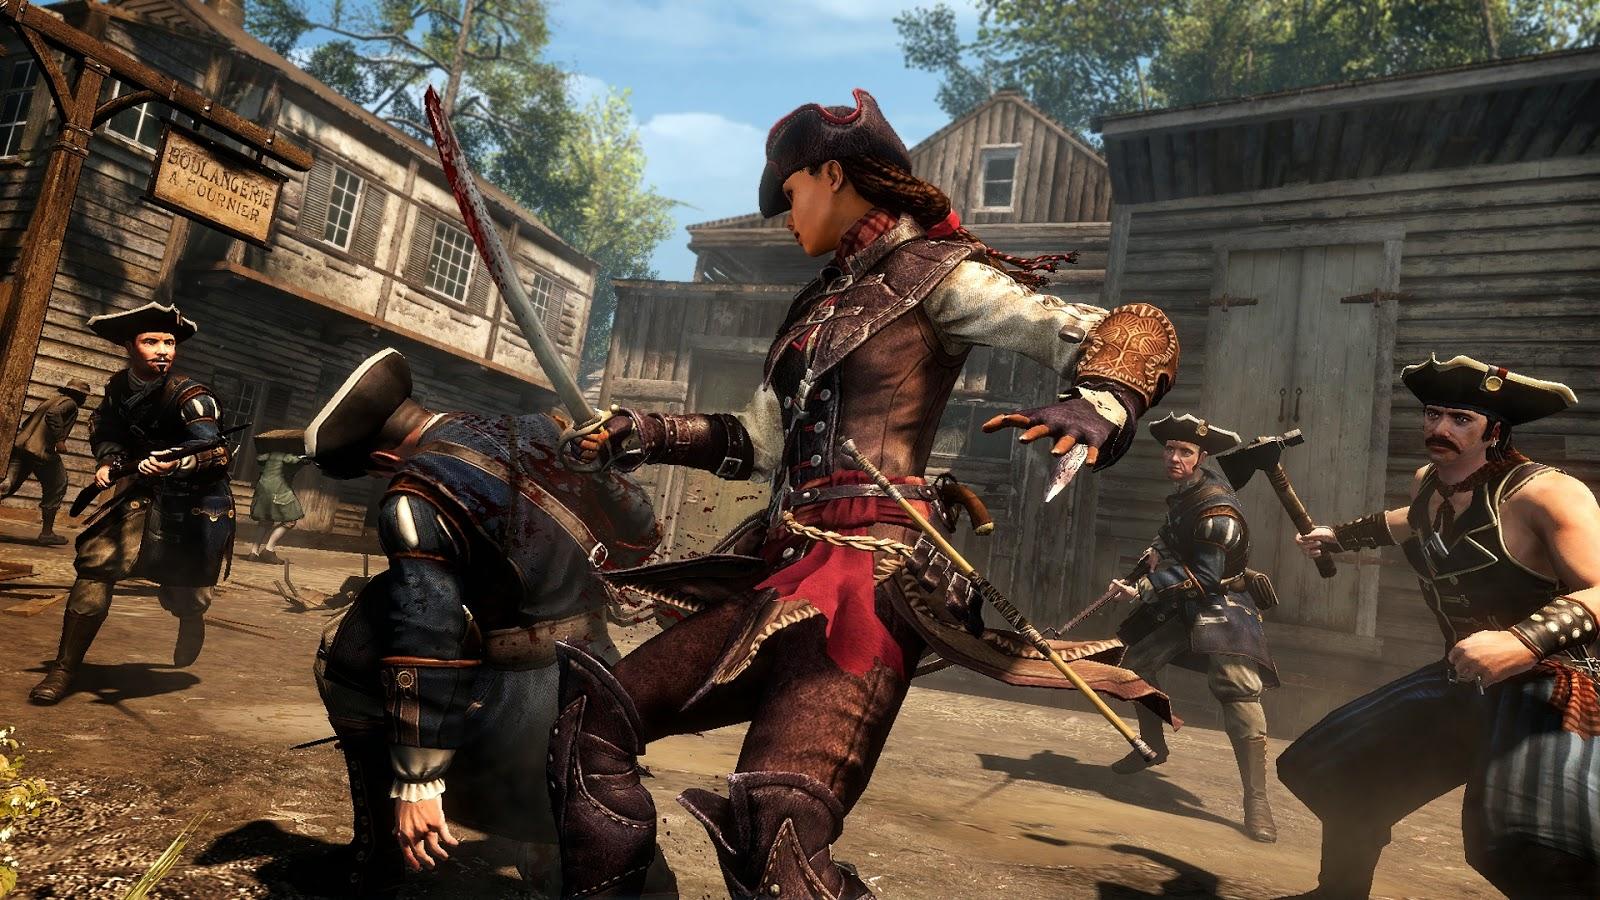 Aveline Assassin's Creed 3